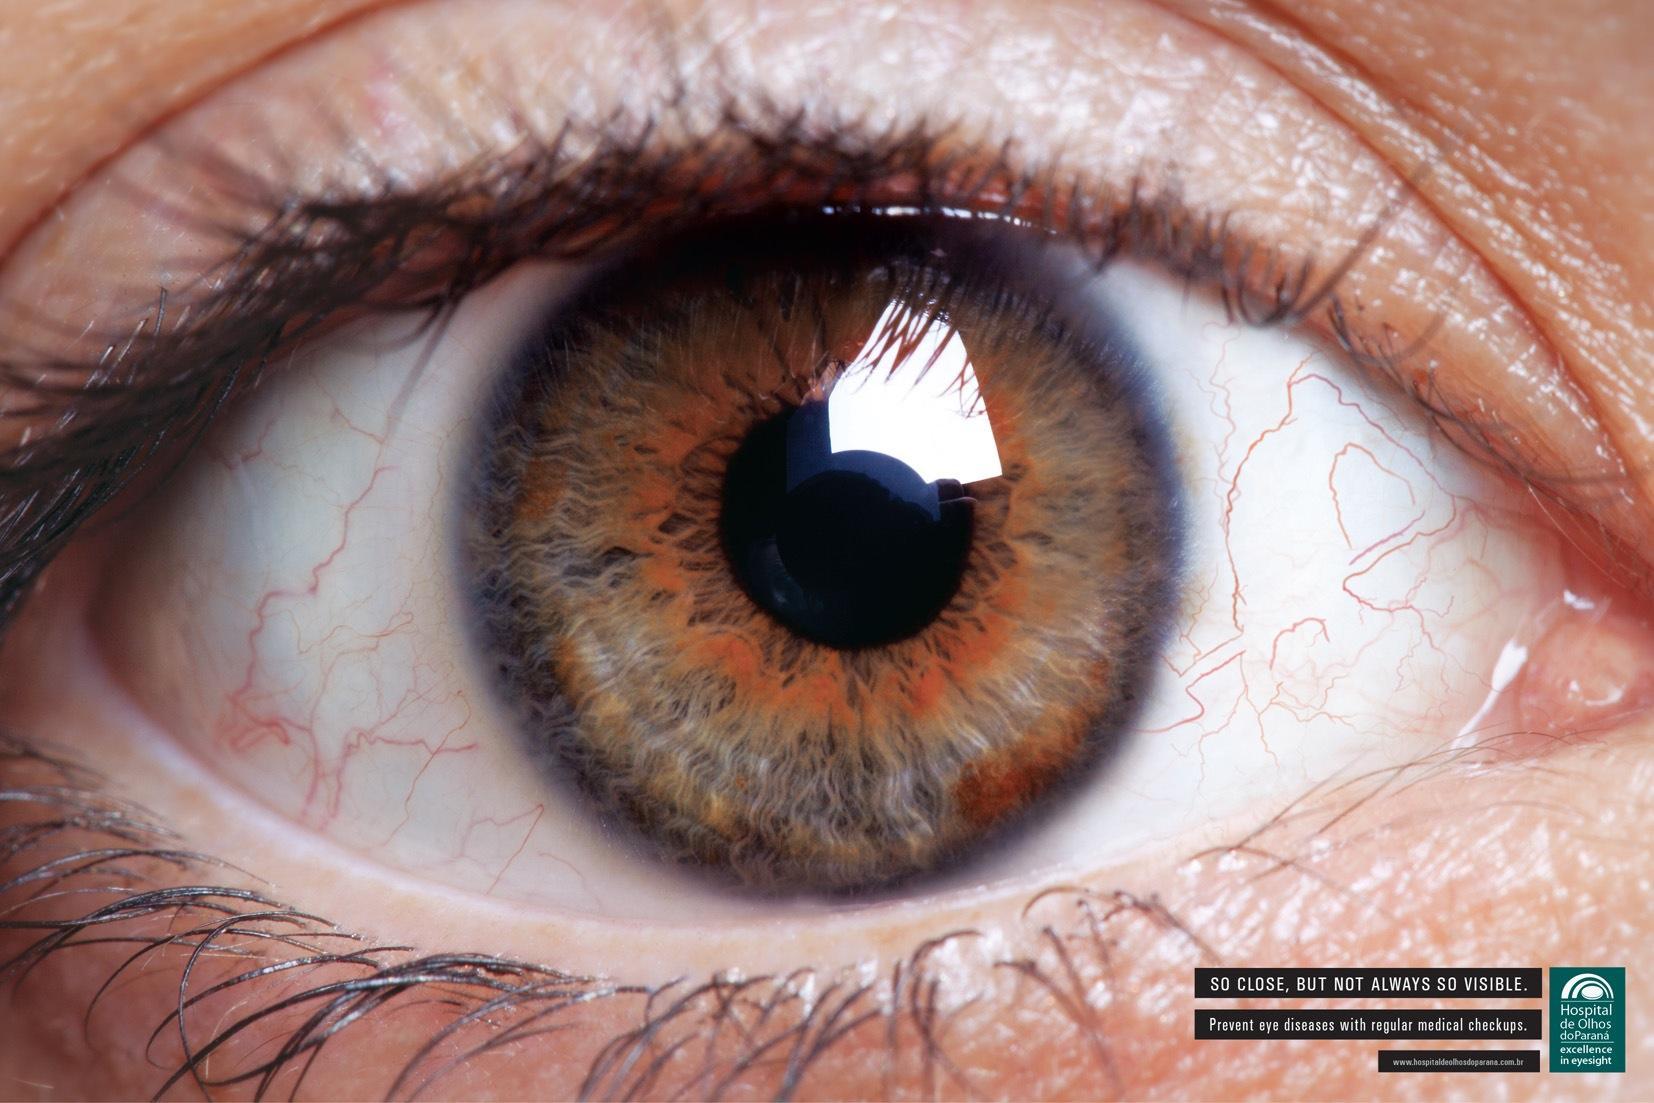 Hospital de Olhos do Paraná Print Ad -  Eye, 2